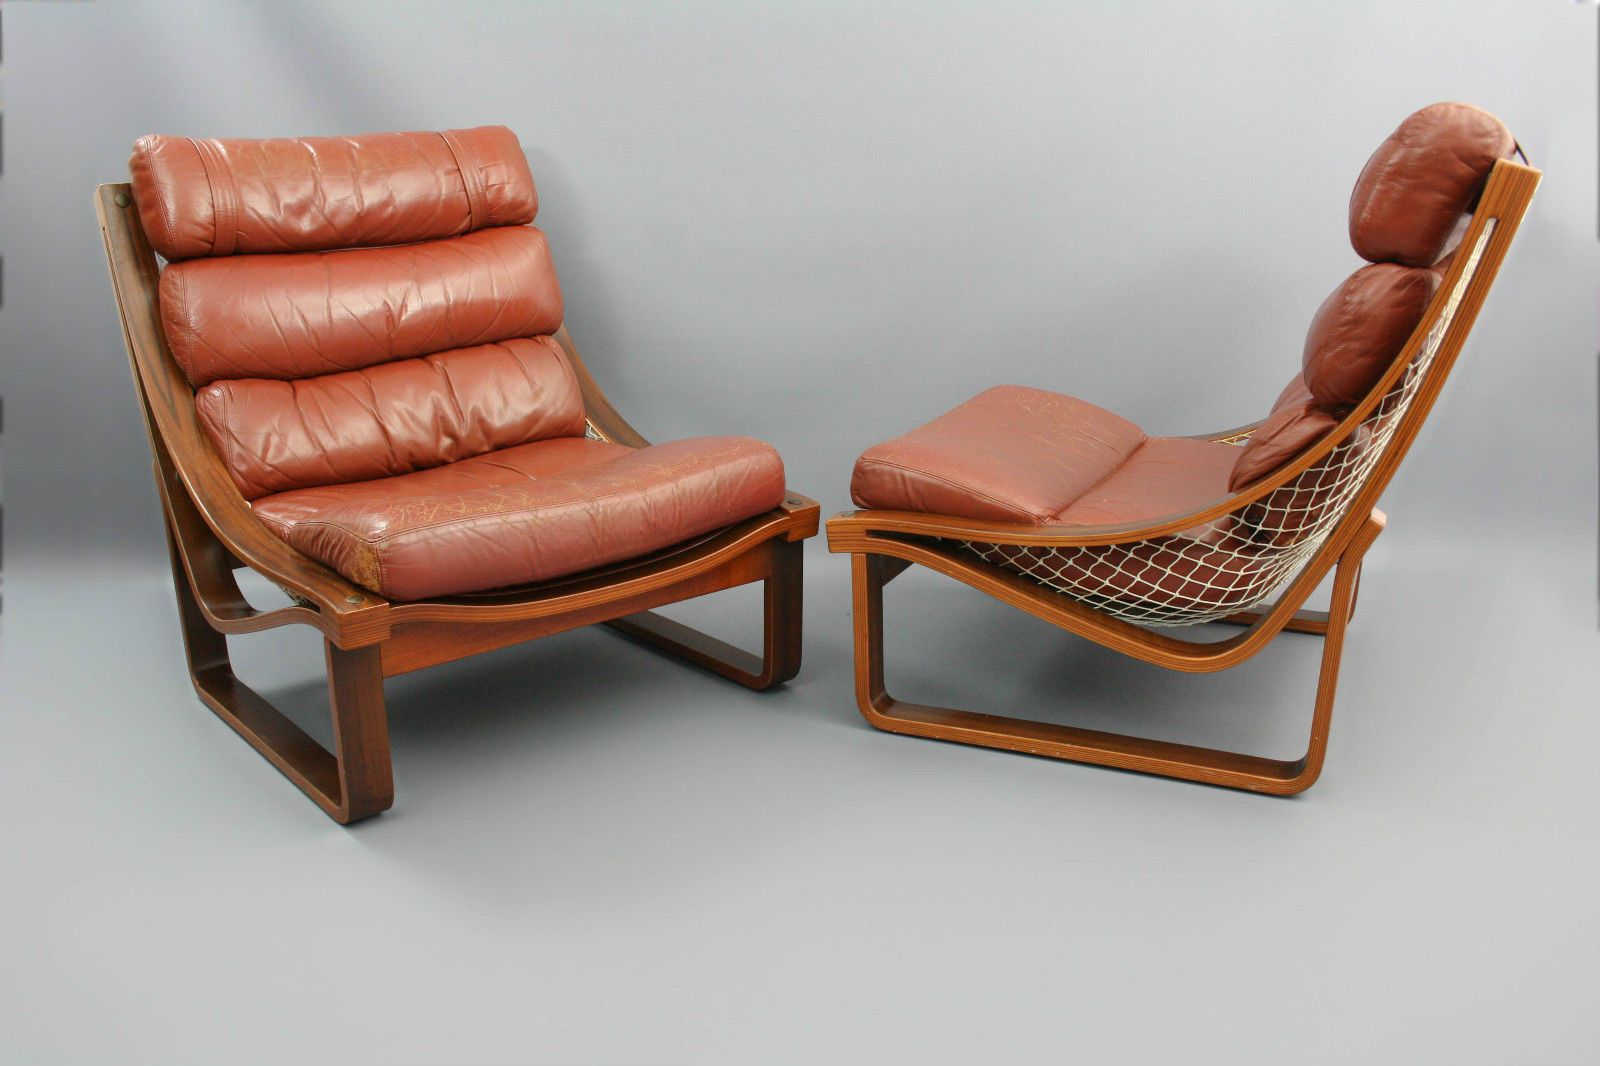 Superb Mid Century X2 Arm Chair Tessa T4 Fred Lowen Leather Lounge Spiritservingveterans Wood Chair Design Ideas Spiritservingveteransorg